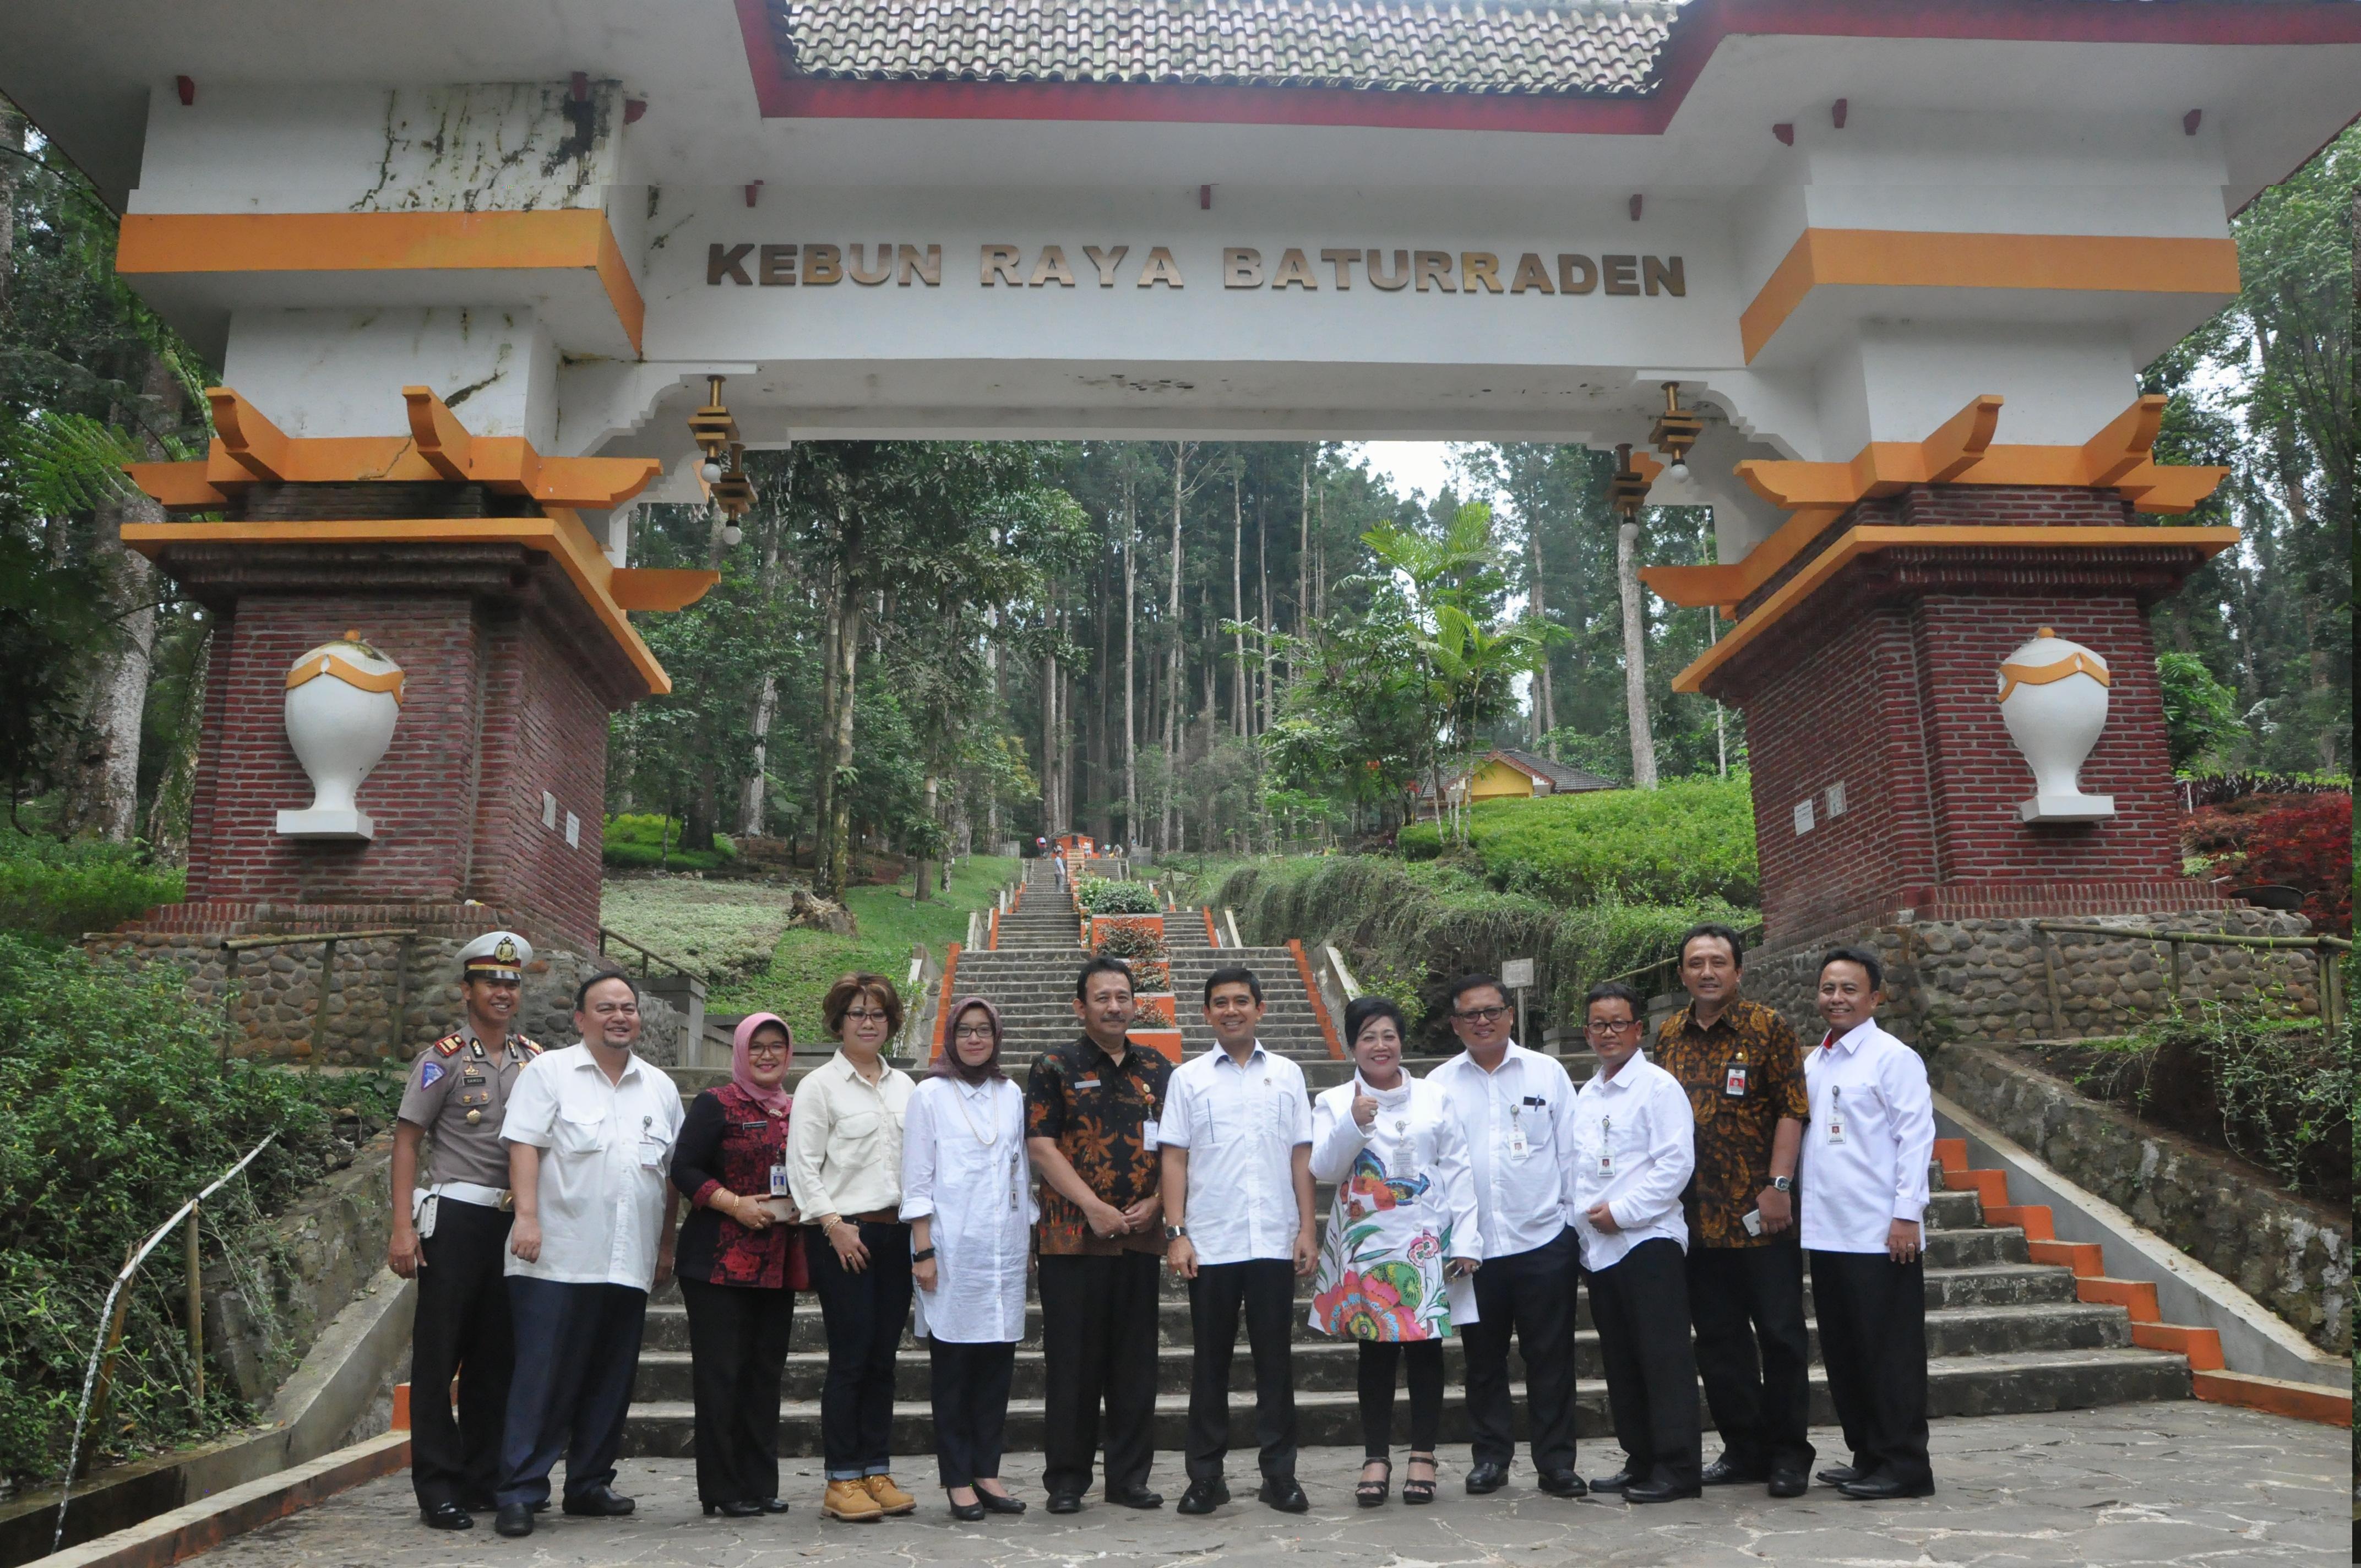 Menpan Yuddy Pun Mampir Kebun Raya Baturaden Banyumasnews Dsc 0487